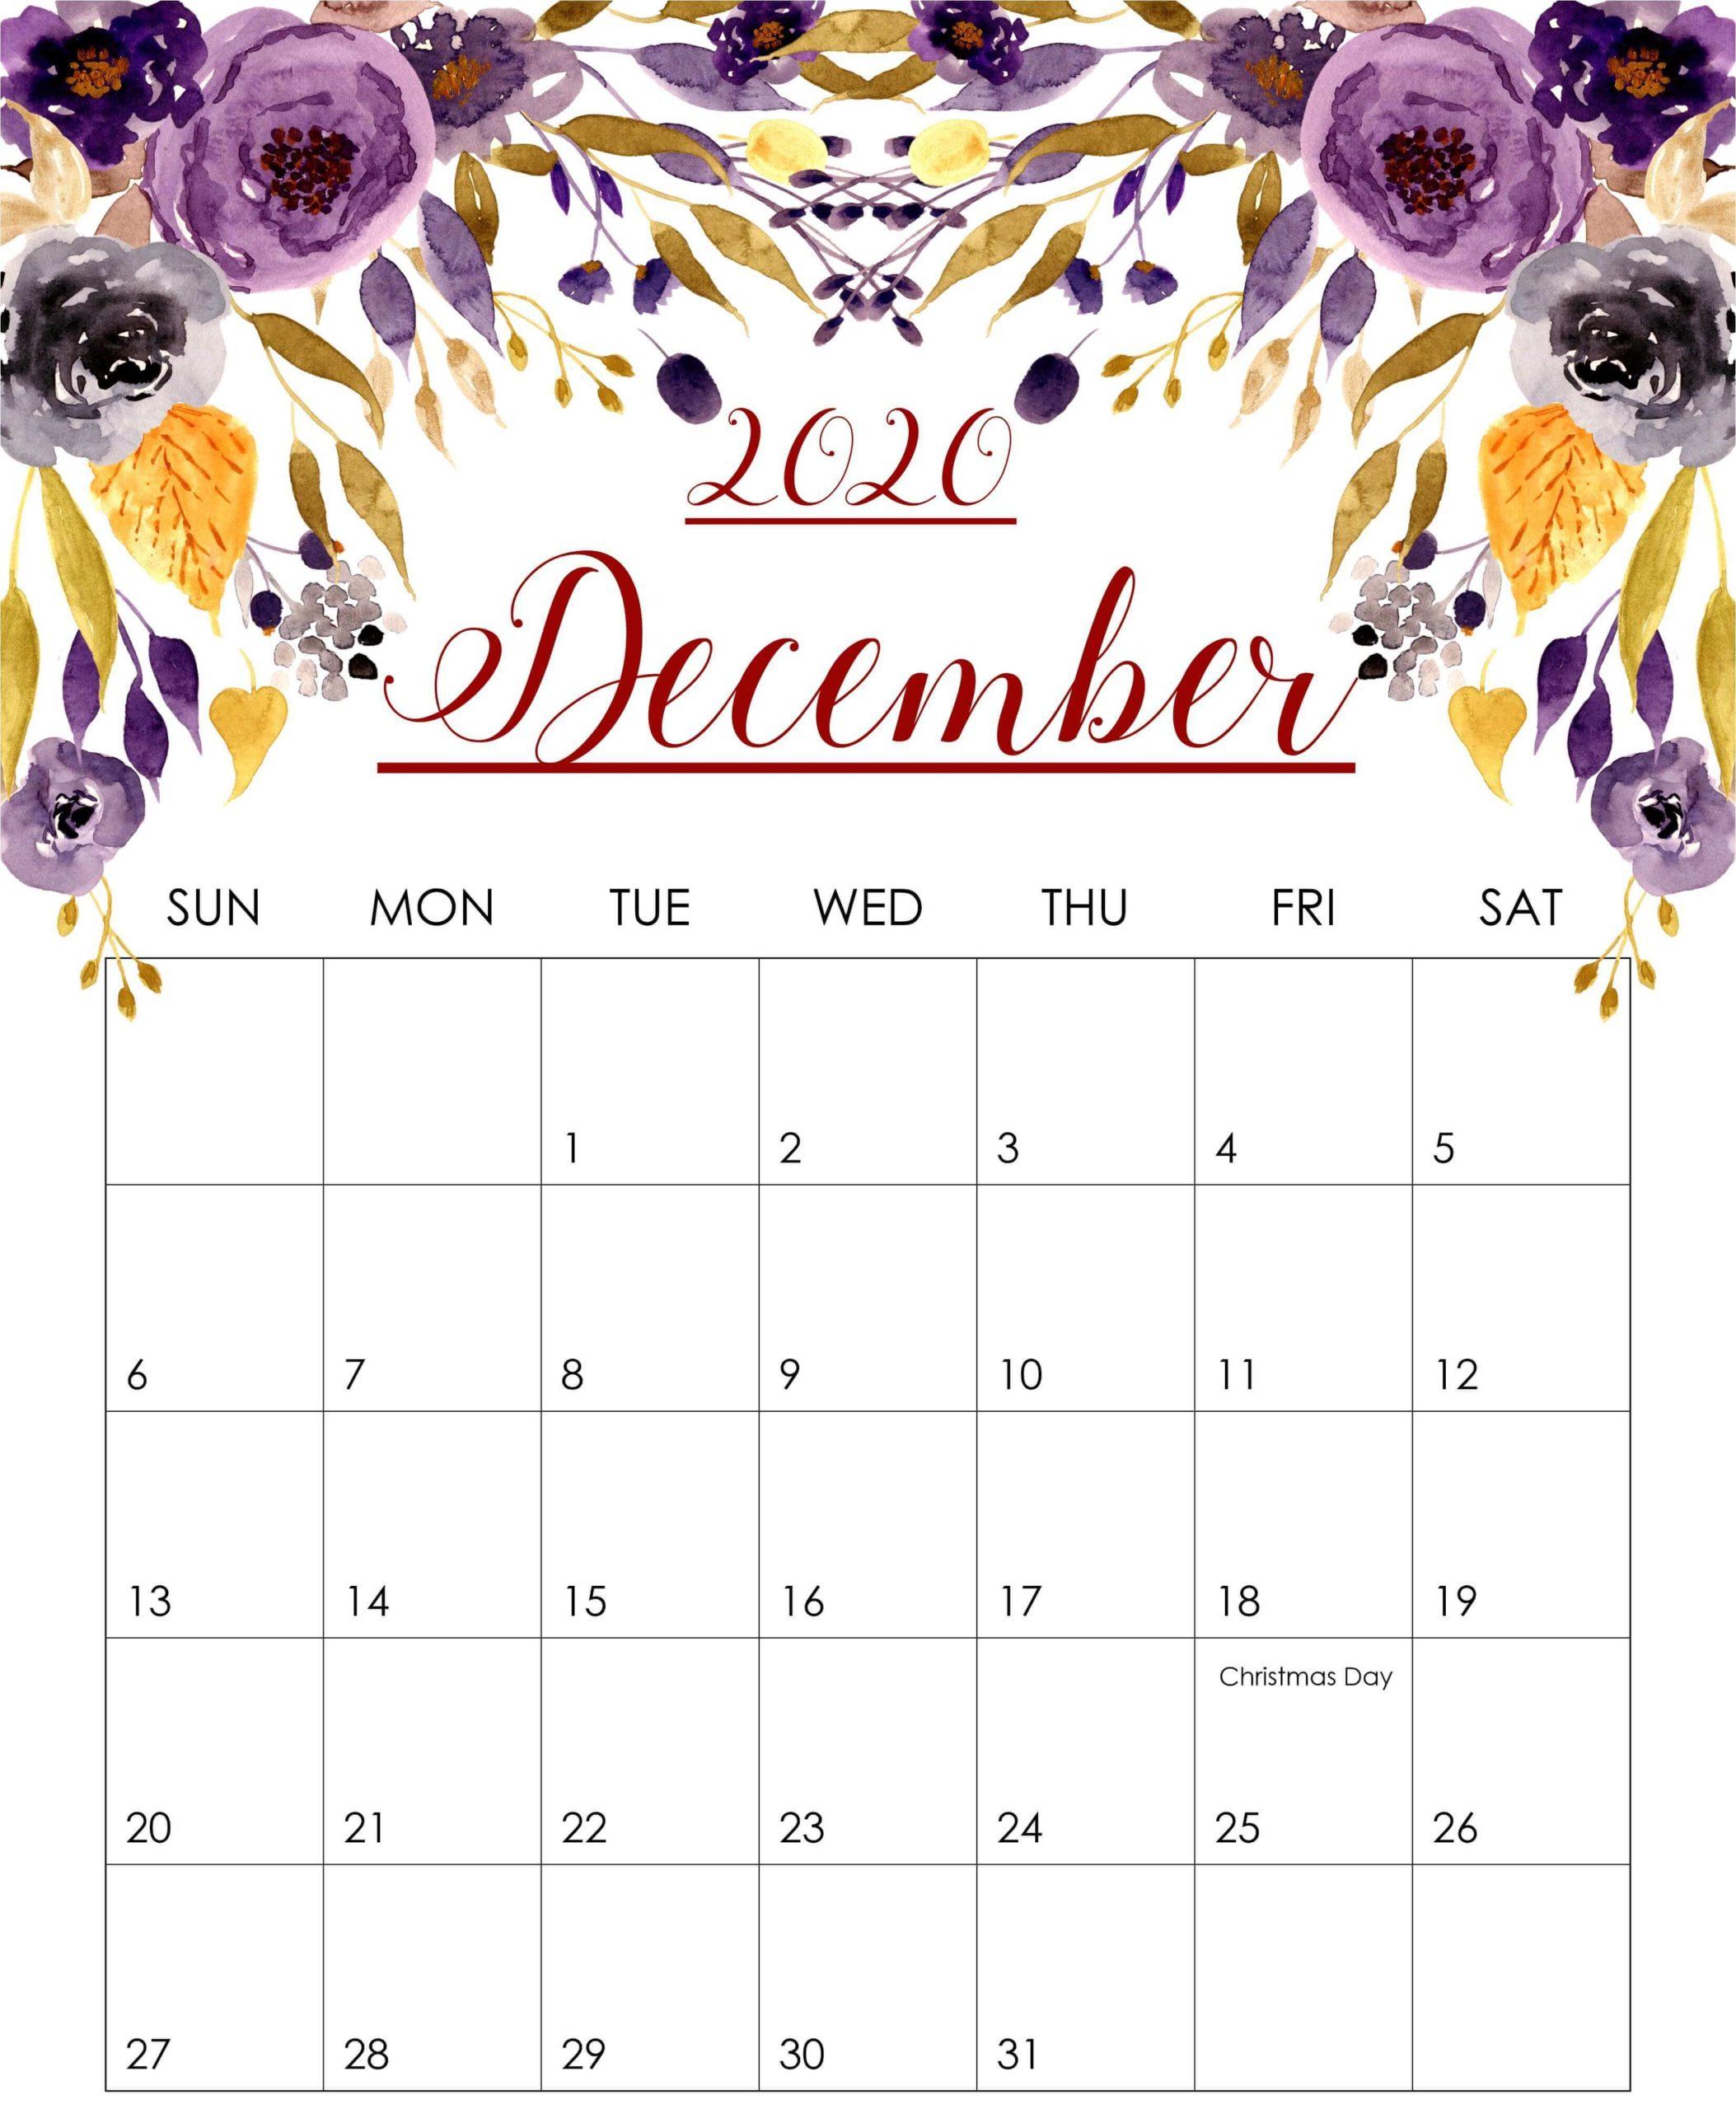 Floral December 2020 Calendar Printable